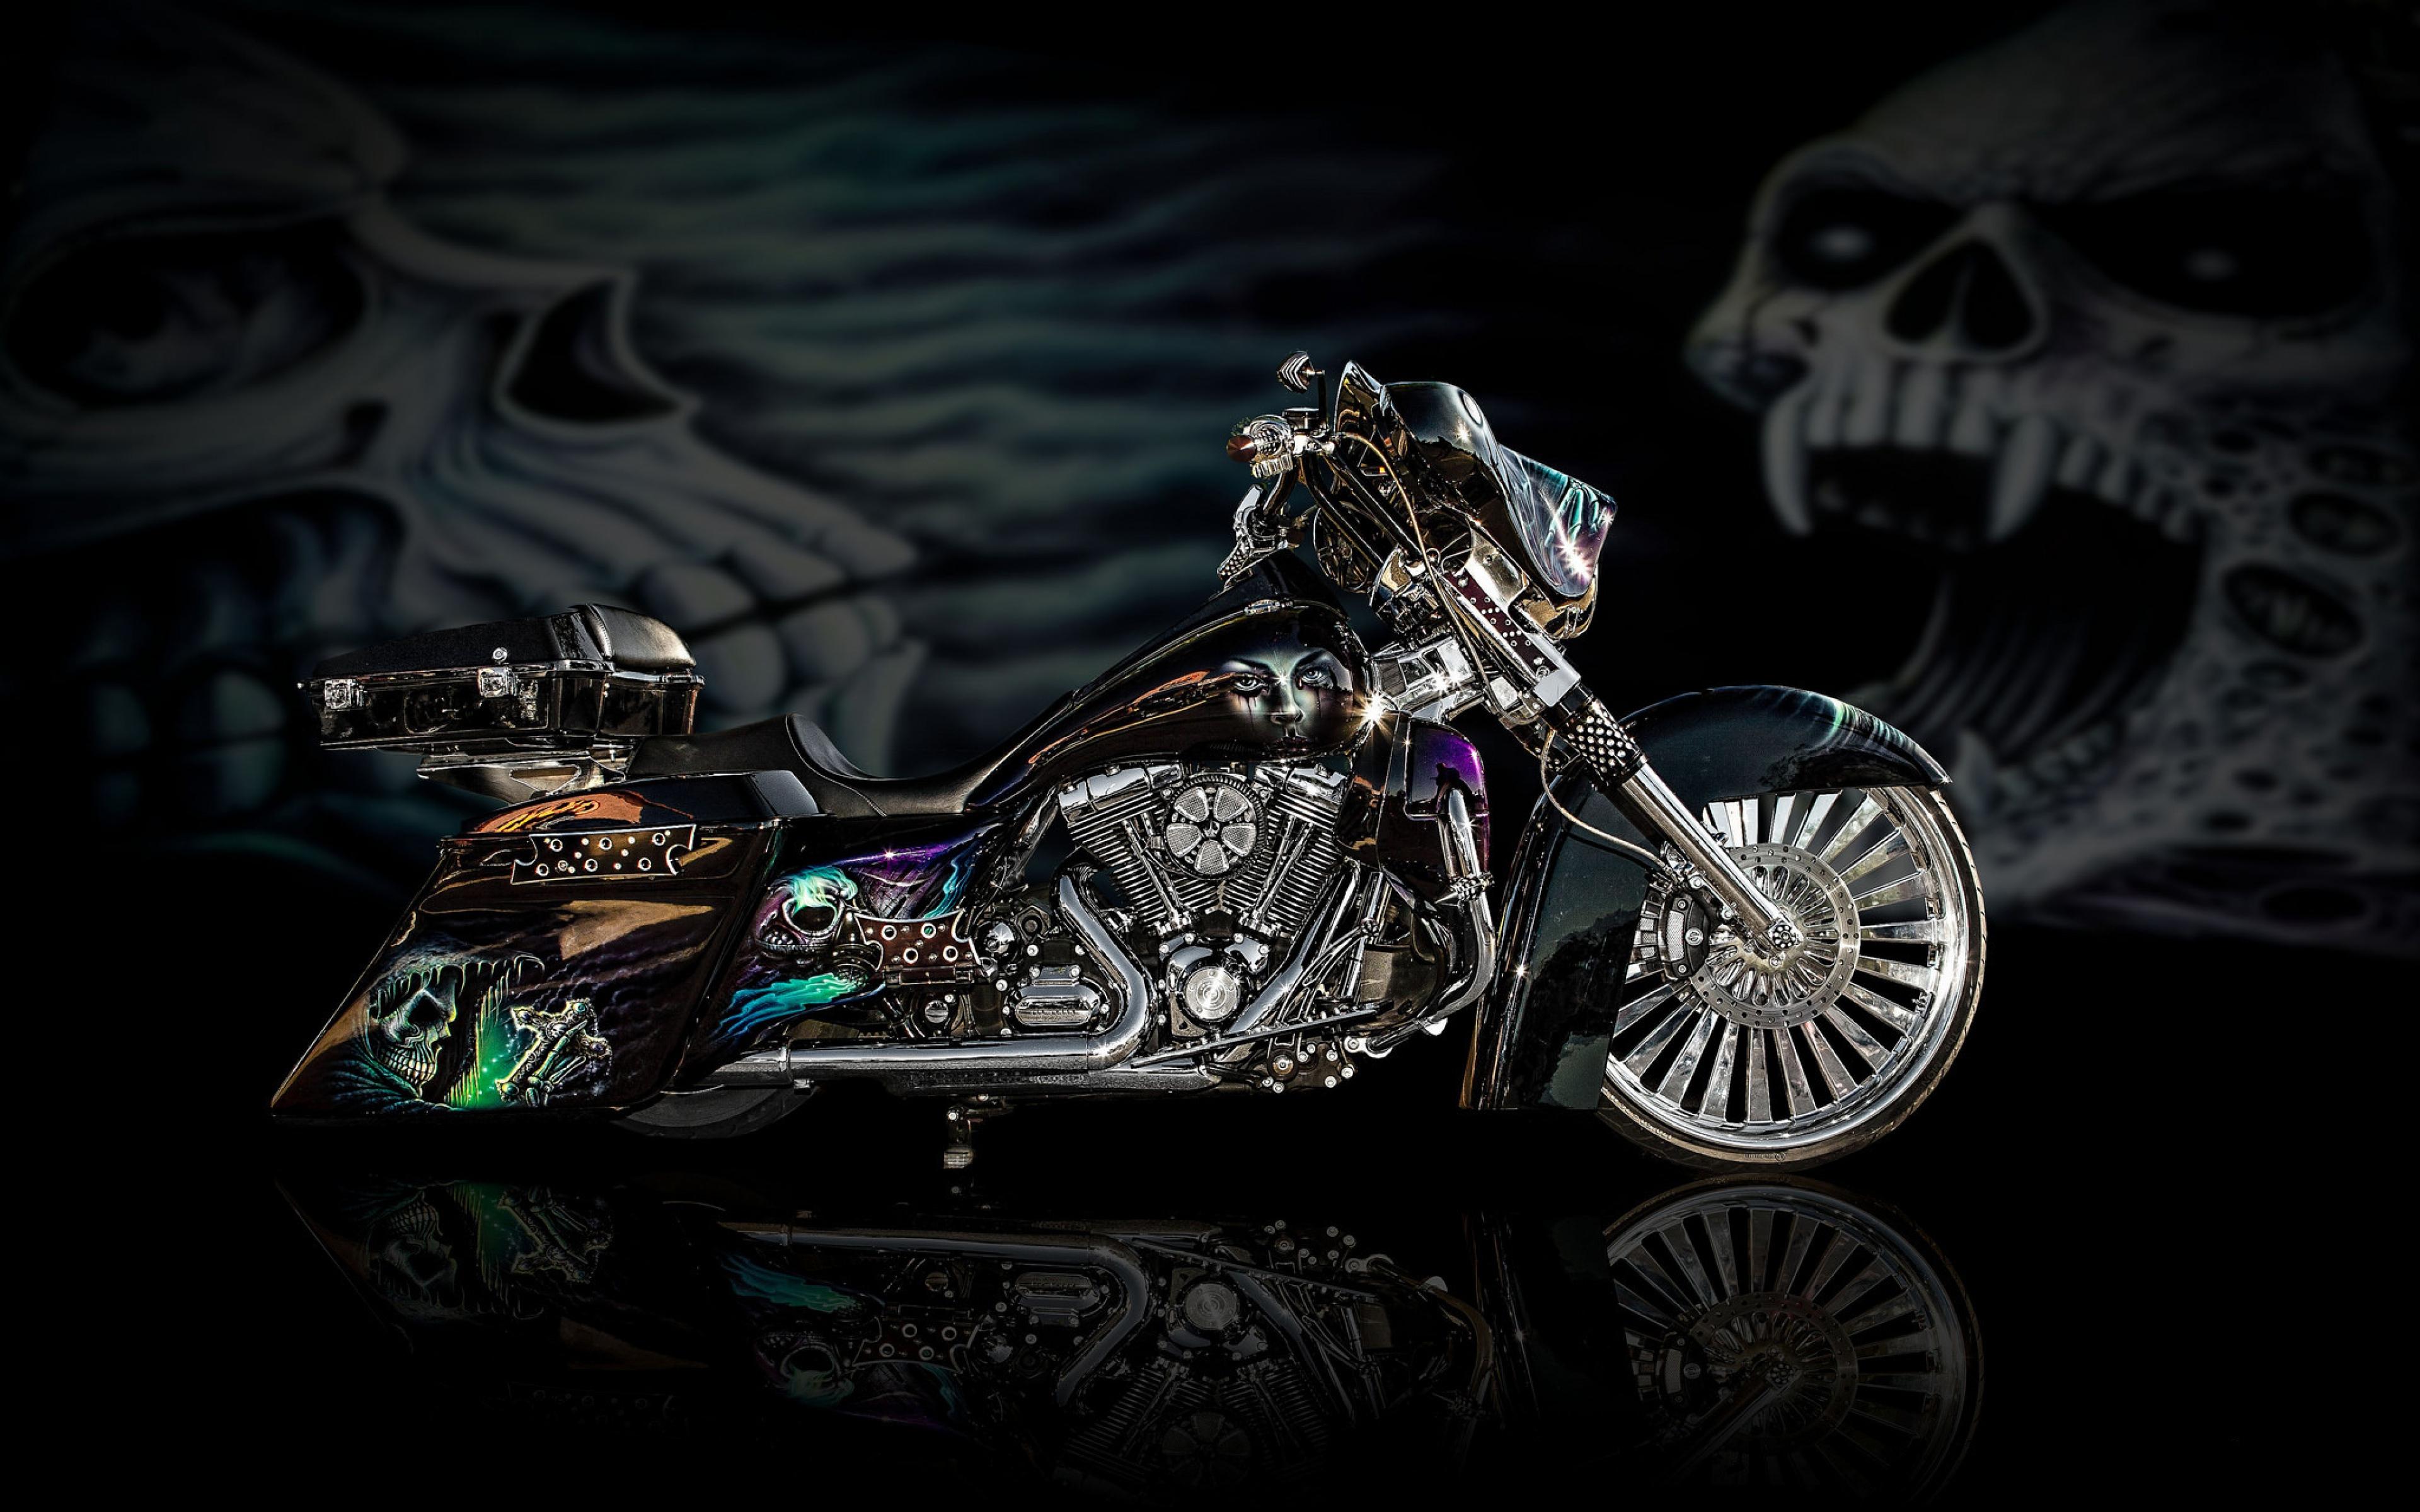 Luxury Motorcycle Hd Wallpapers: Motorcycles Bike Design Airbrush, HD Bikes, 4k Wallpapers